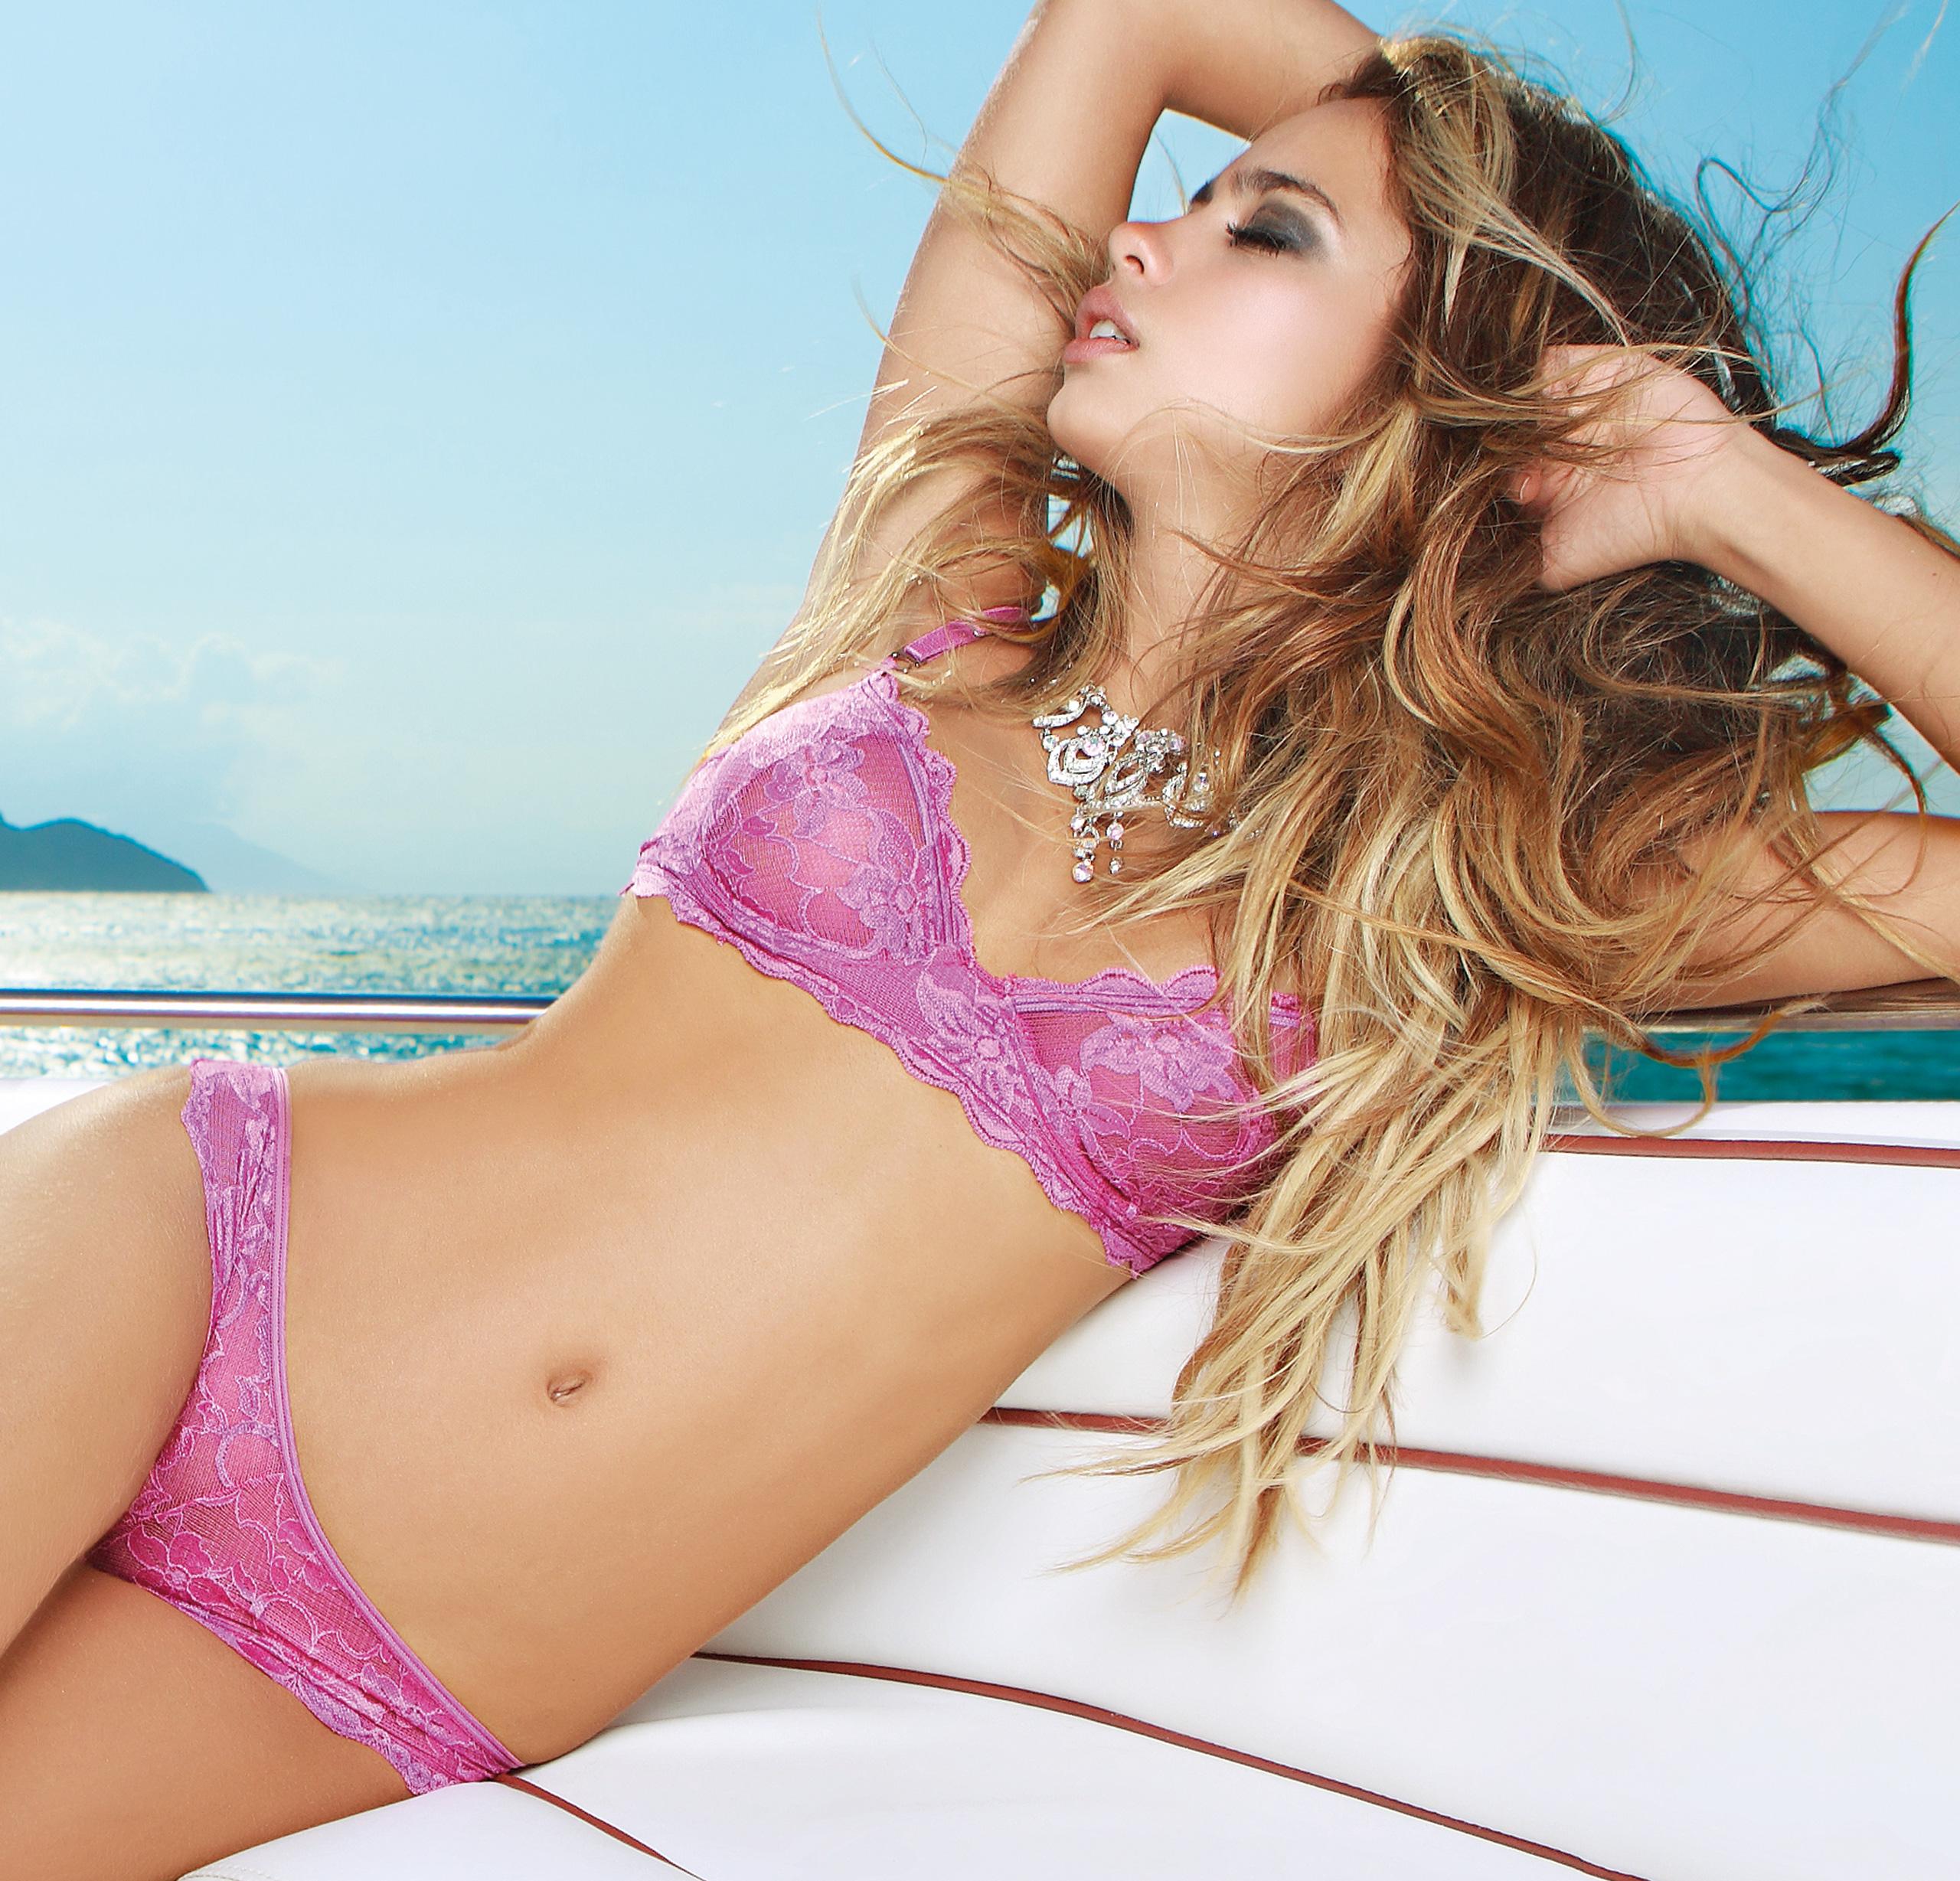 Catalina Otalvaro in Maia Underwear photoshoot (Spring-Summer 2014). Каталина Отальваро в фотосессии Maia lingerie -коллекция Весна-Лето 2014.